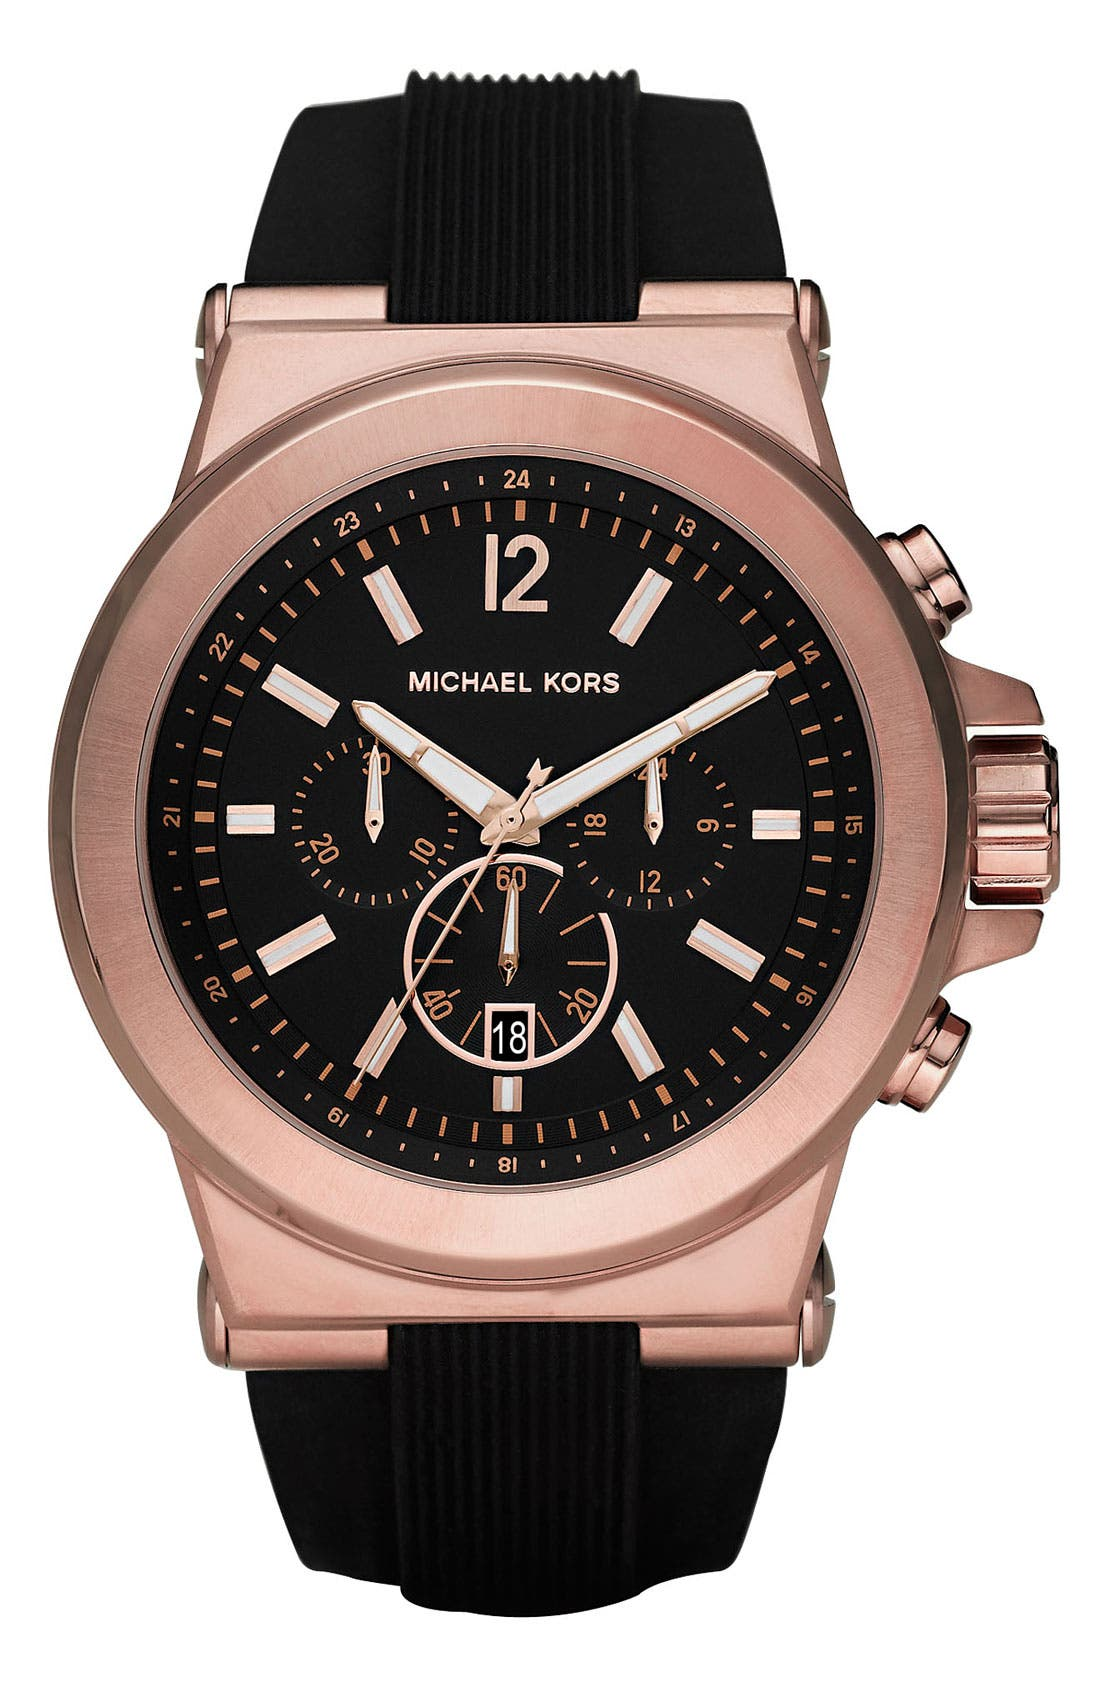 MICHAEL KORS Chronograph Watch, 45mm, Main, color, ROSE GOLD/ BLACK